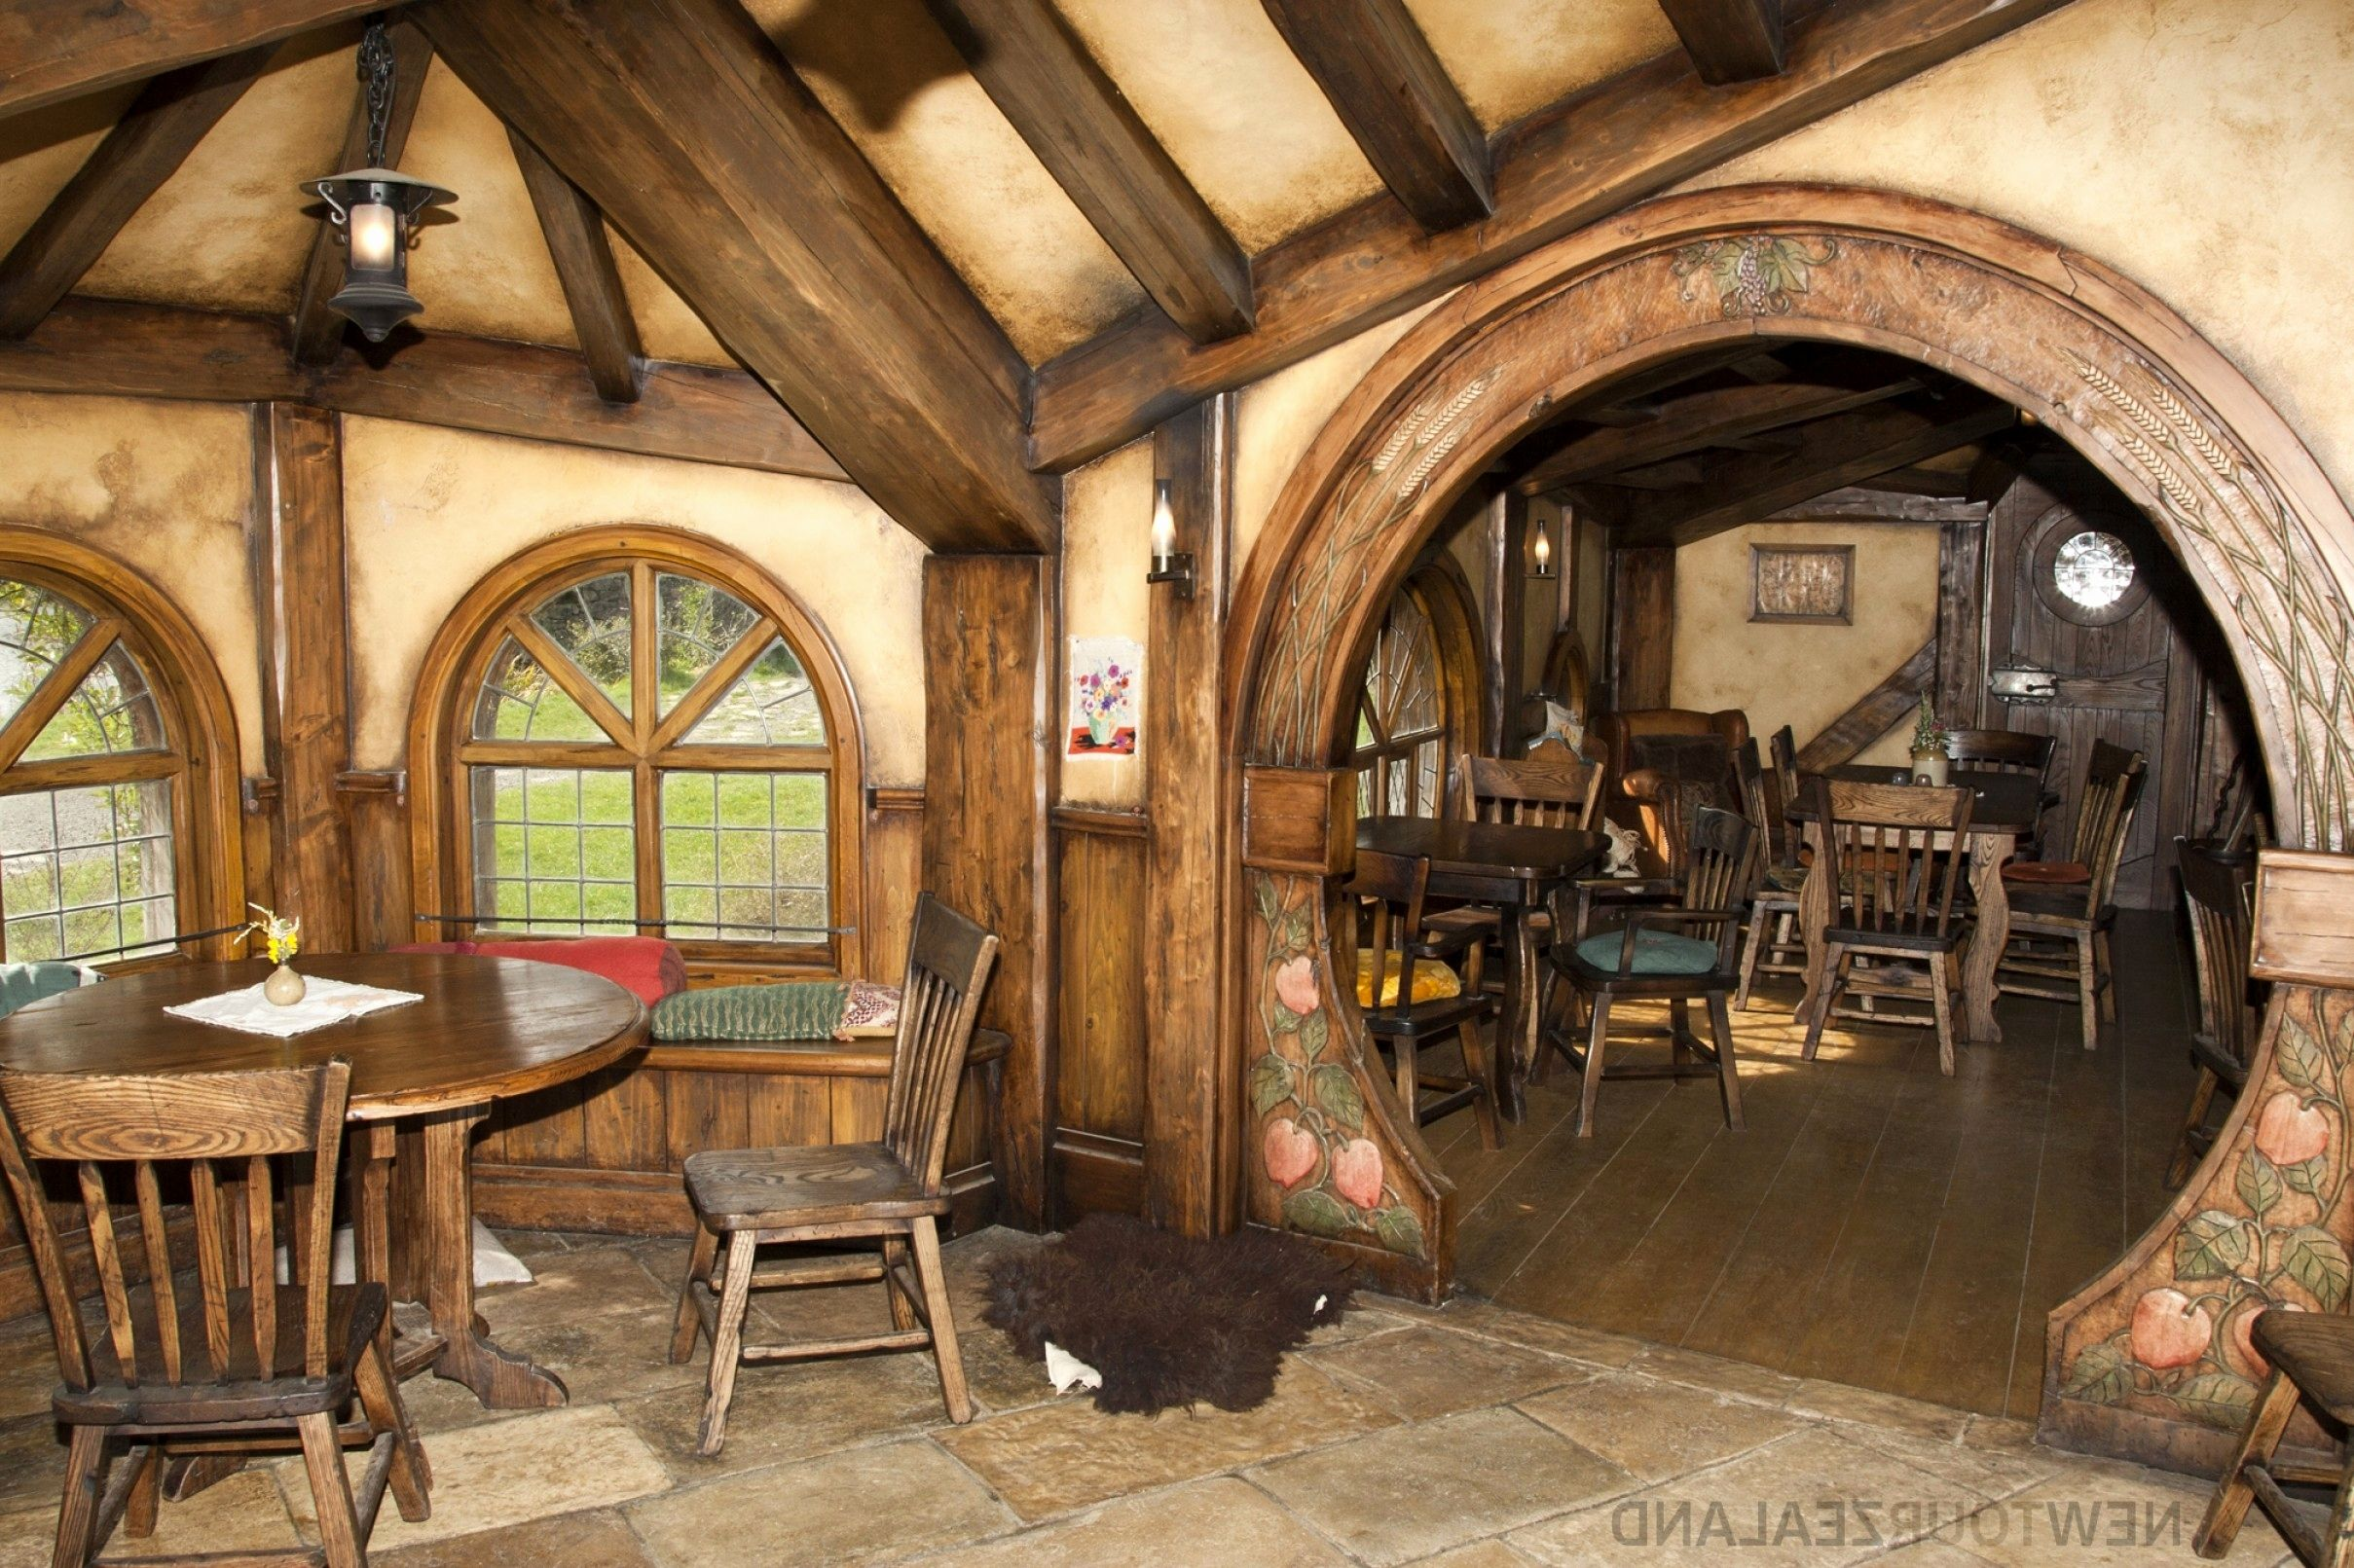 Image Result For Hobbit House Plans Hobbit House Hobbit House Interior Round House Plans